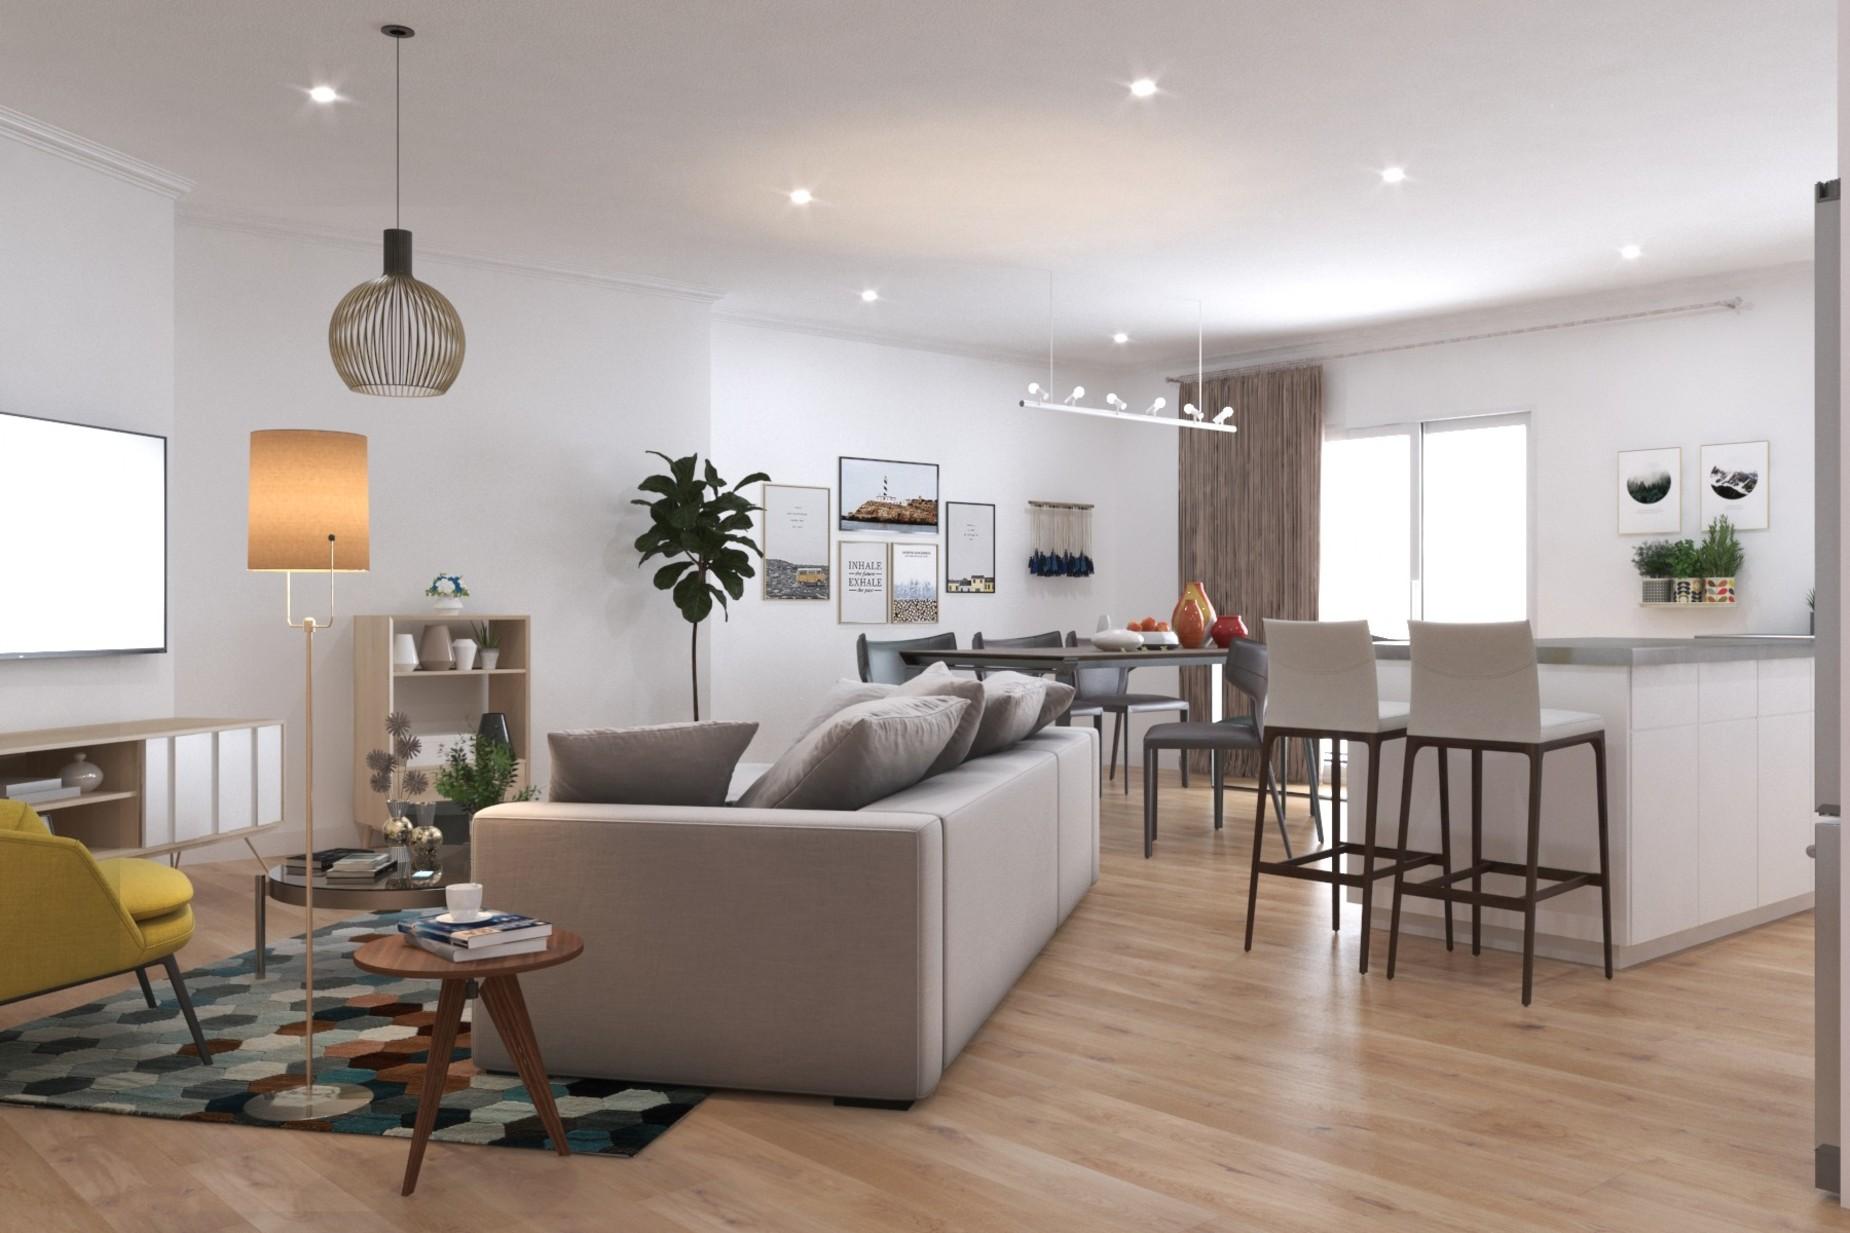 3 bed Apartment For Sale in Birkirkara, Birkirkara - thumb 4